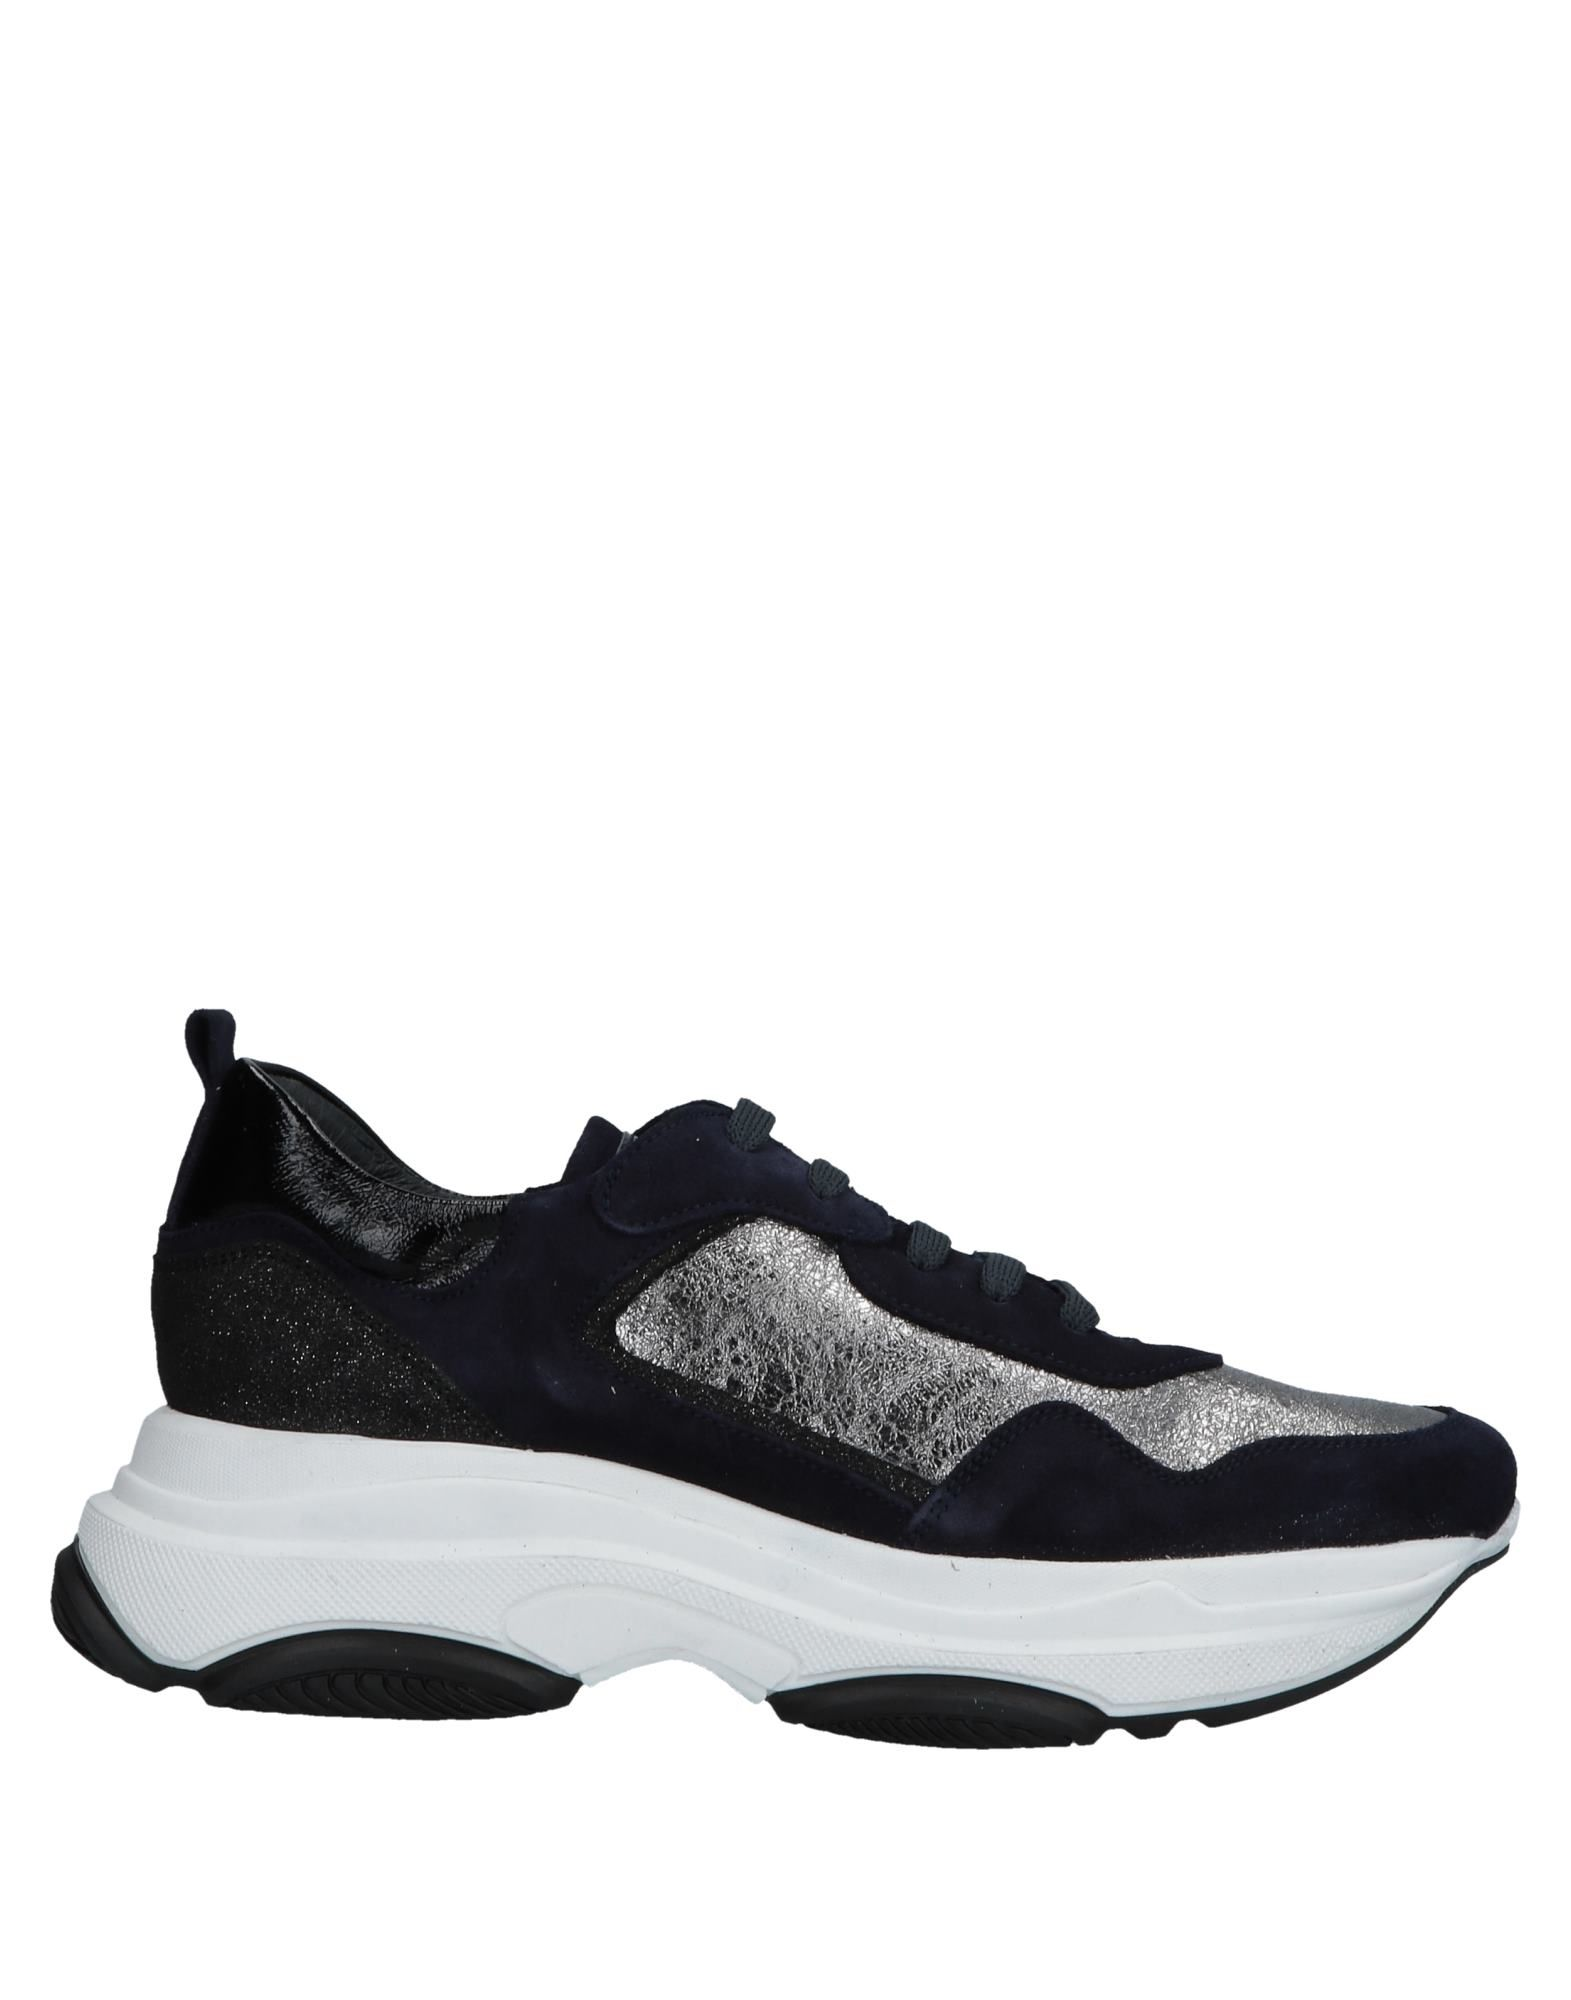 Kanna Sneakers - Women Kanna Sneakers - online on  Canada - Sneakers 11570134FU 863a38